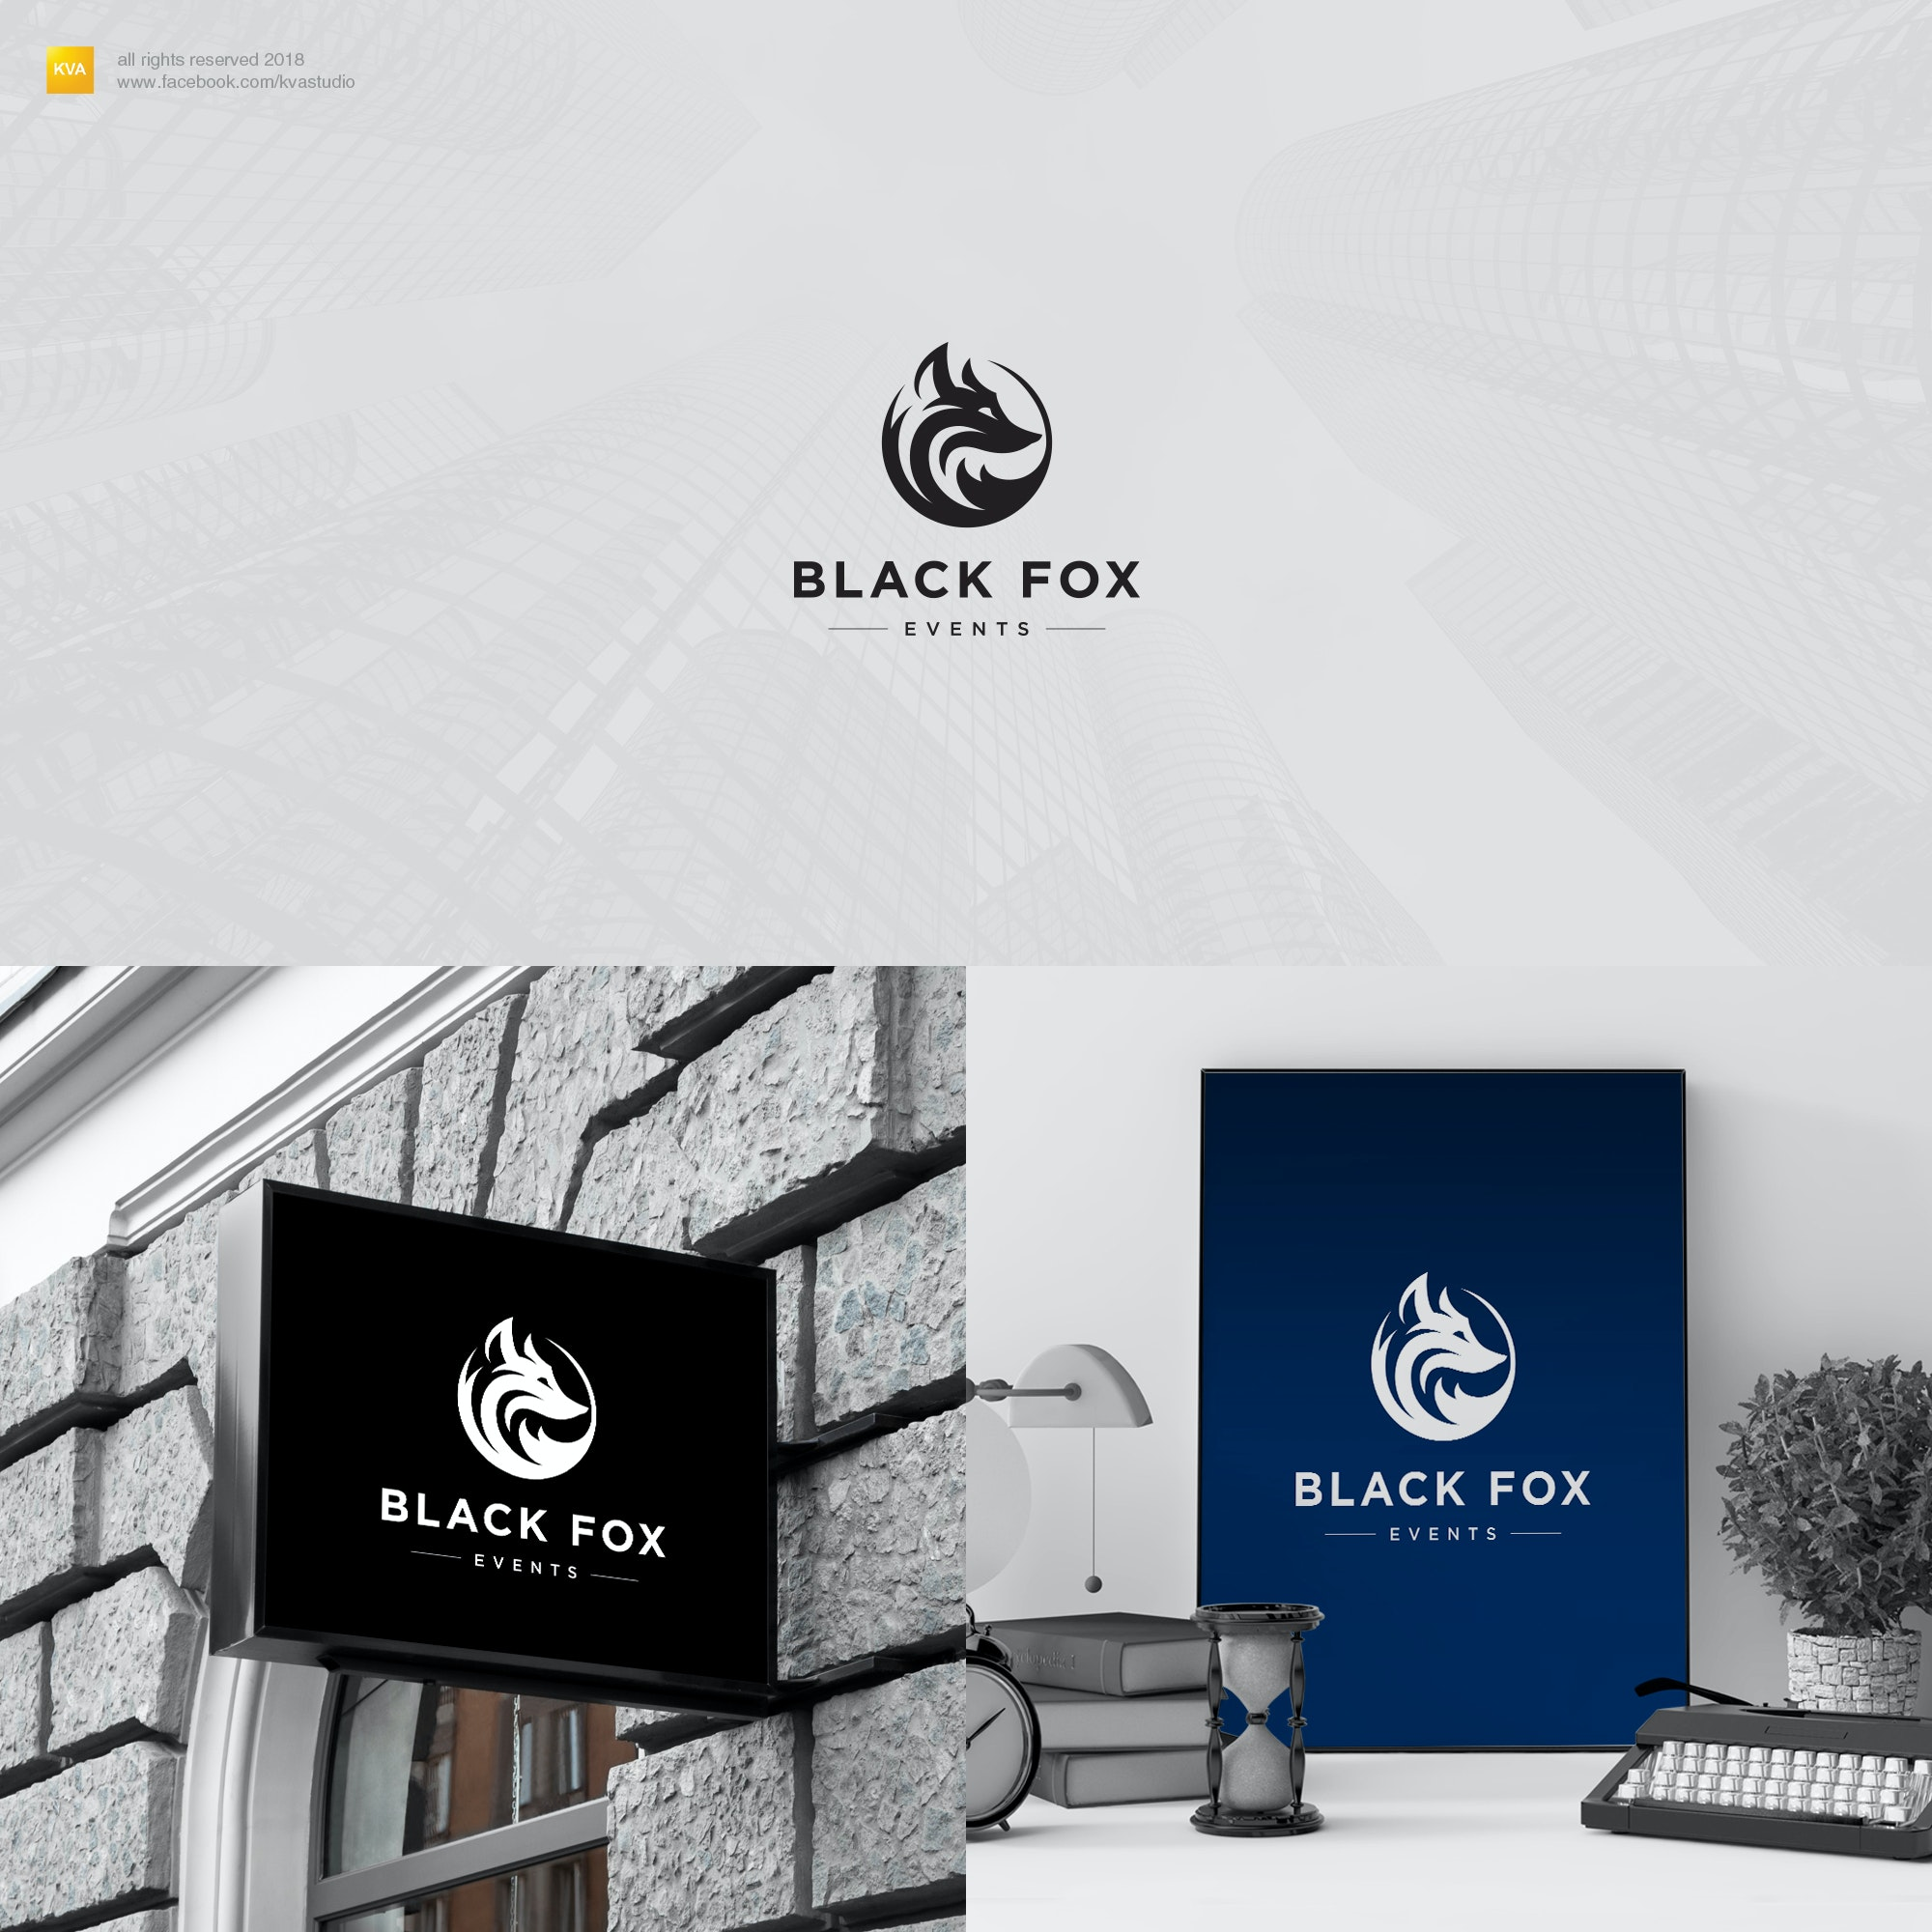 Black Fox Events logo